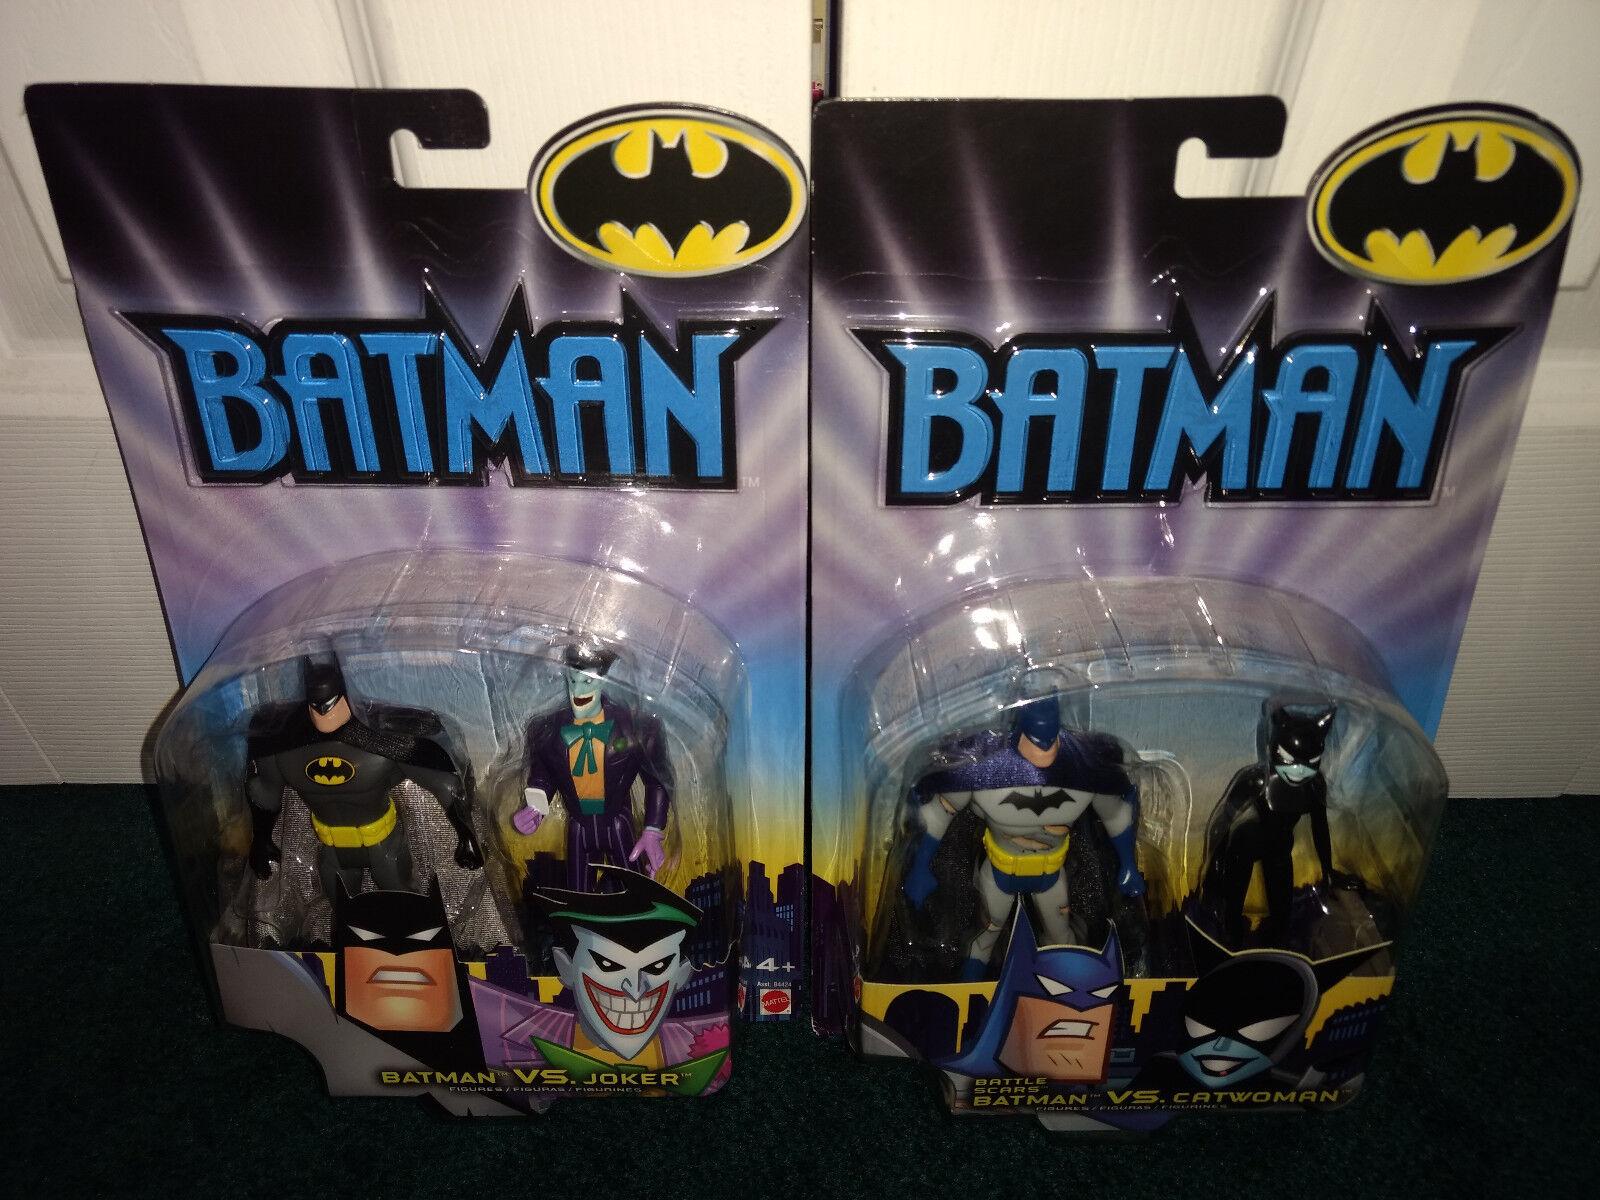 Batman joker + kampfnarben batman catwoman batman animierte dc mattel 2002 misp